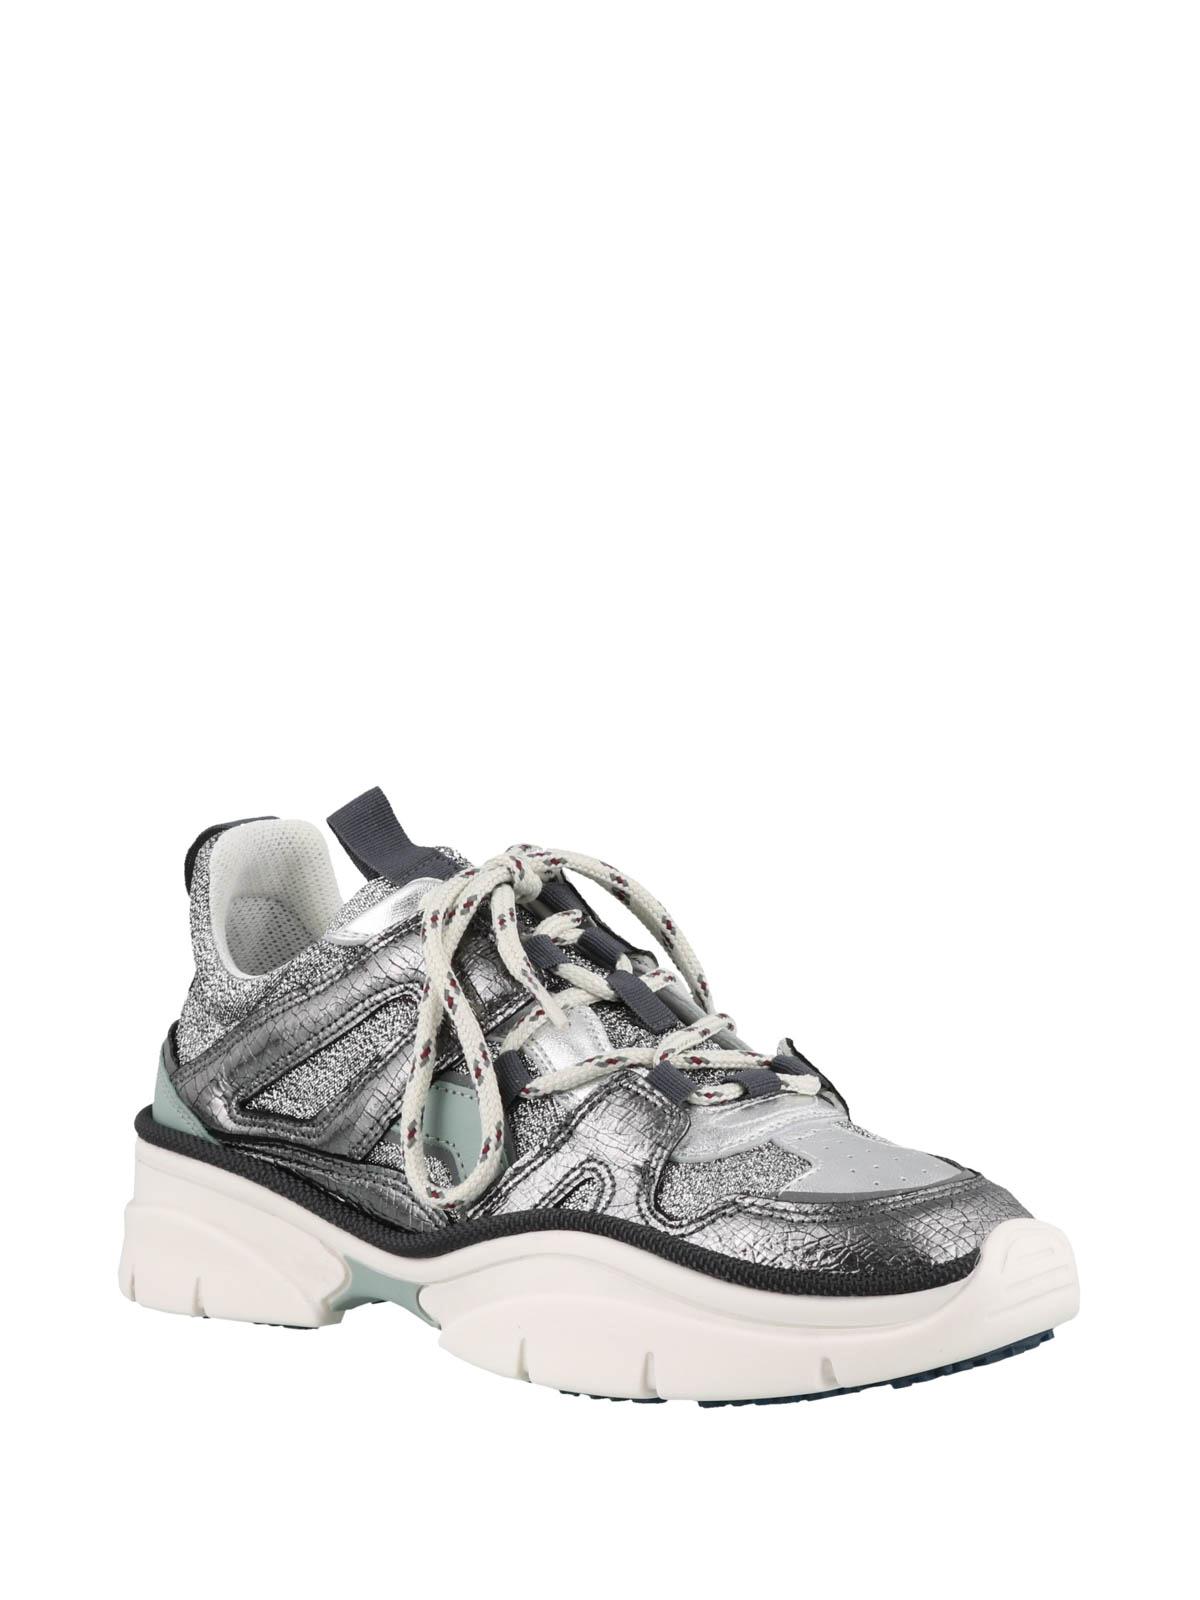 Isabel Marant - Kindsay silver sneakers